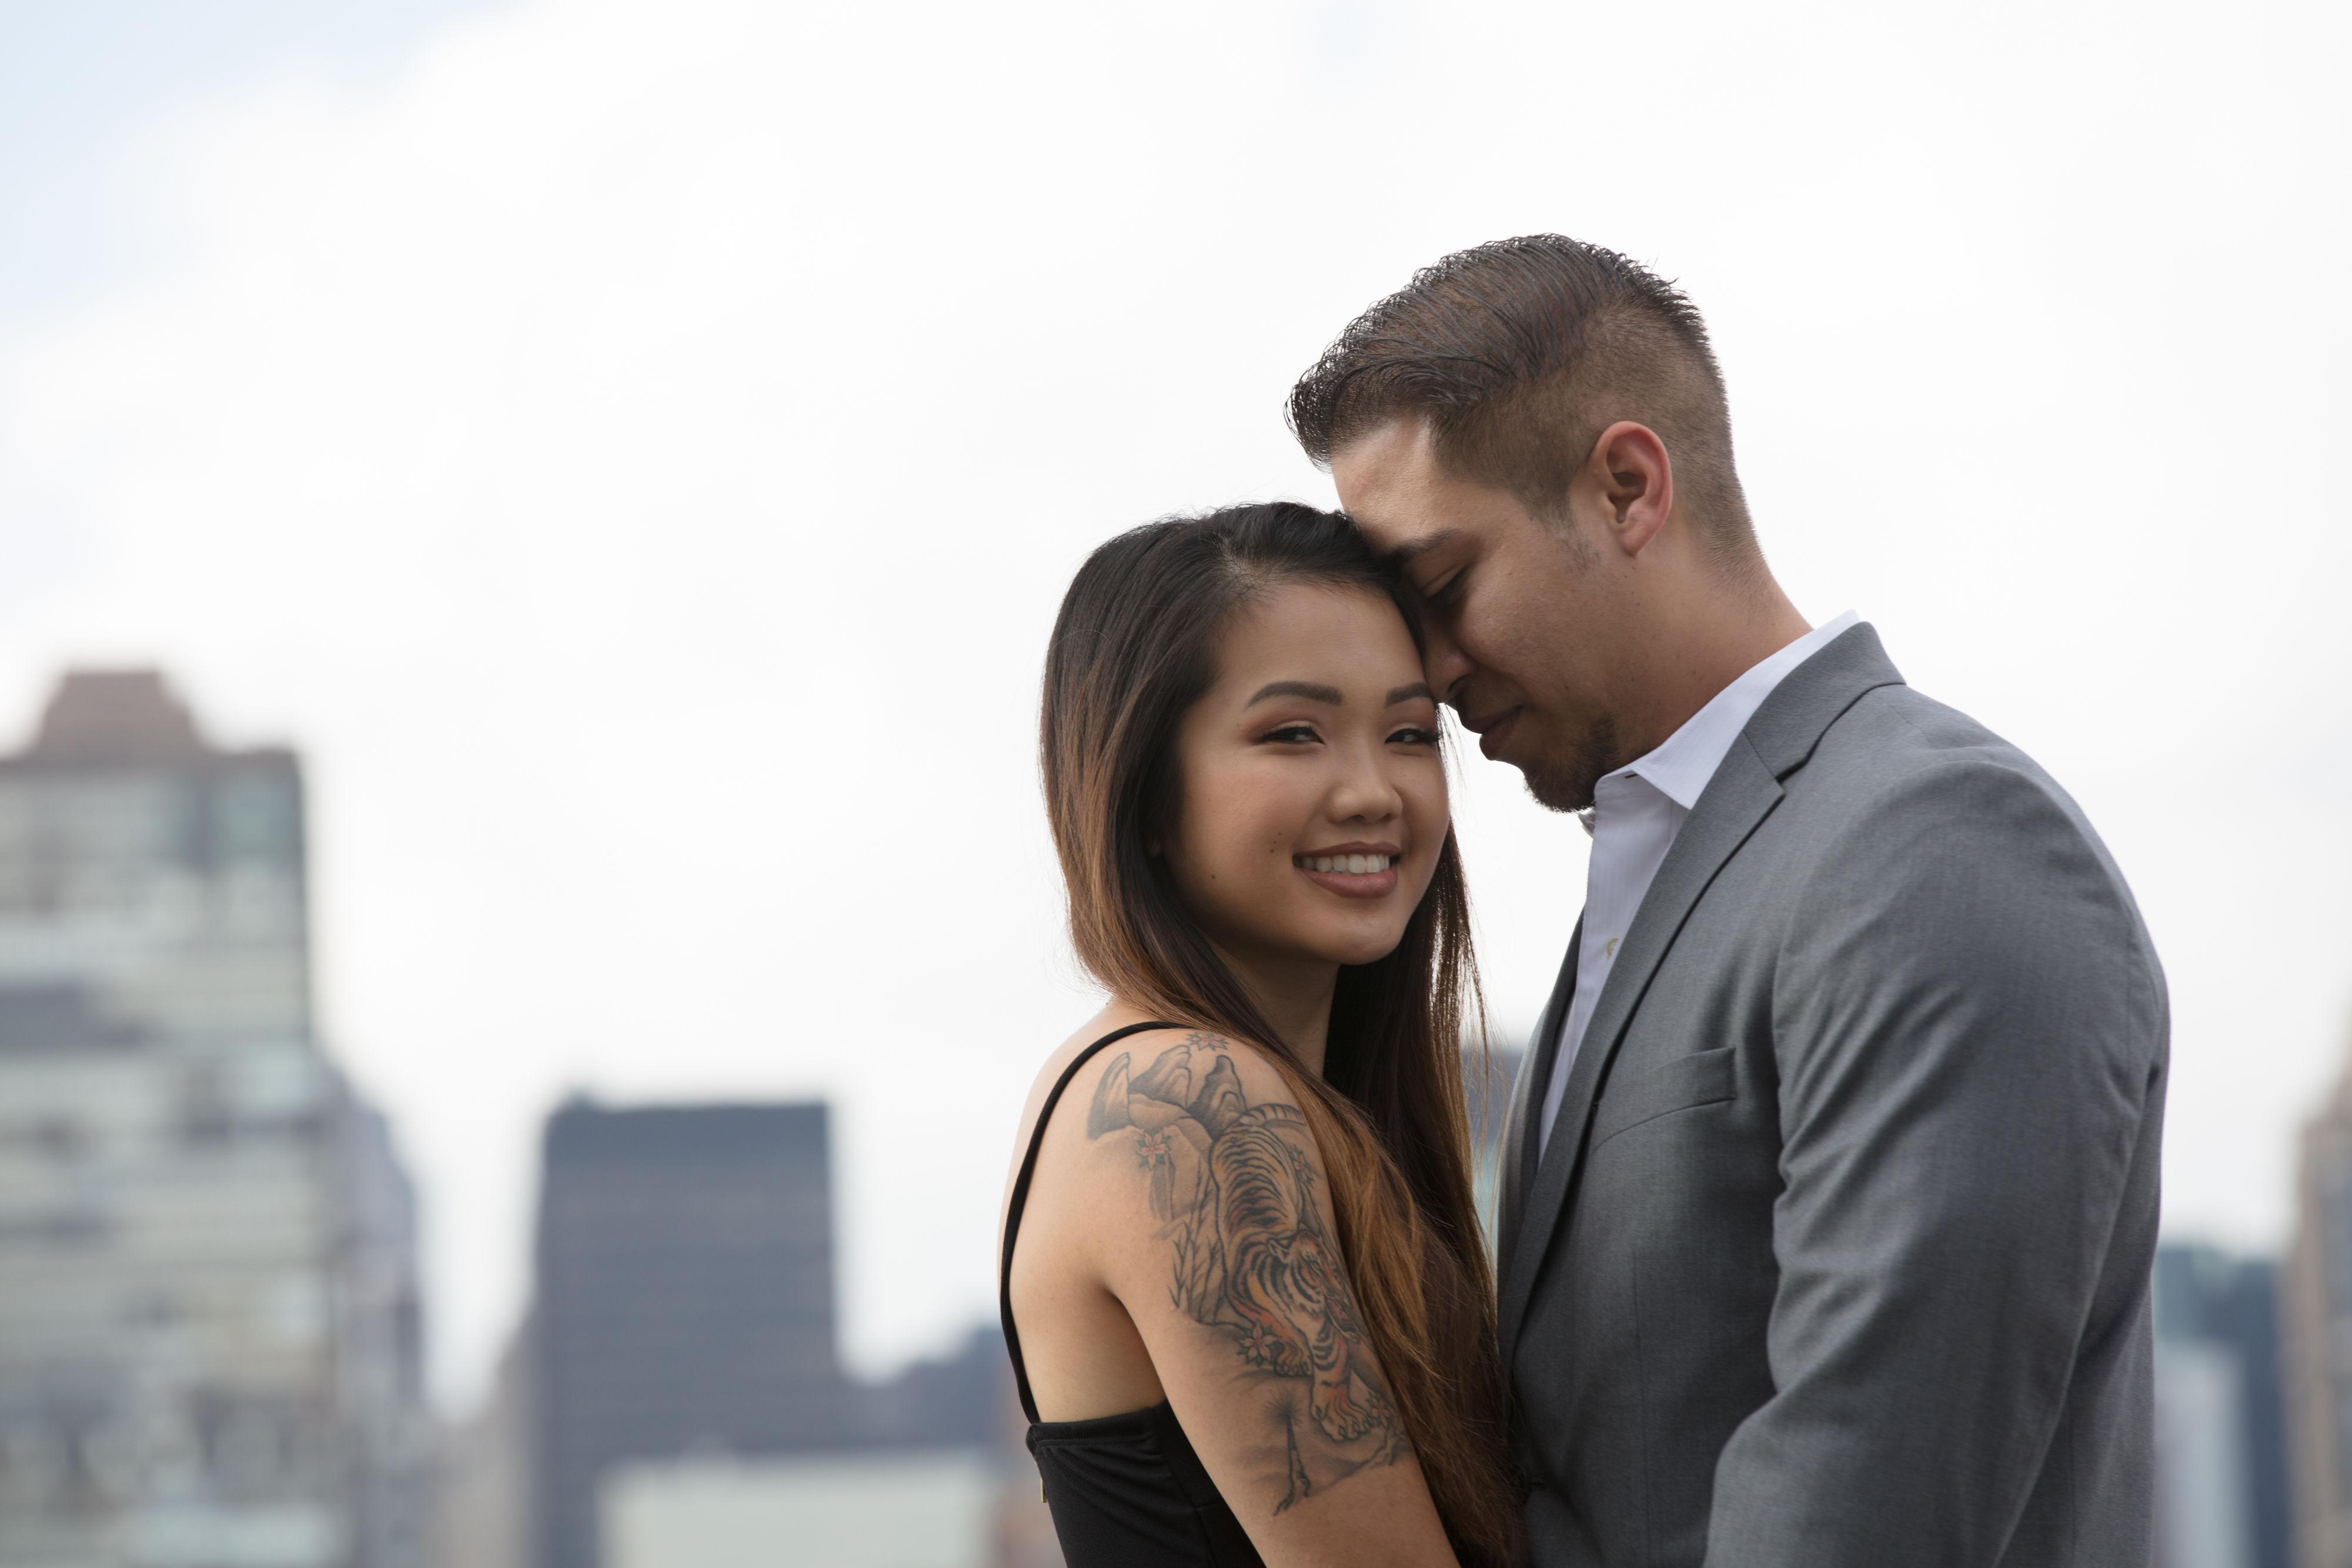 rj amp lillys wedding wedding website wedding on aug 20